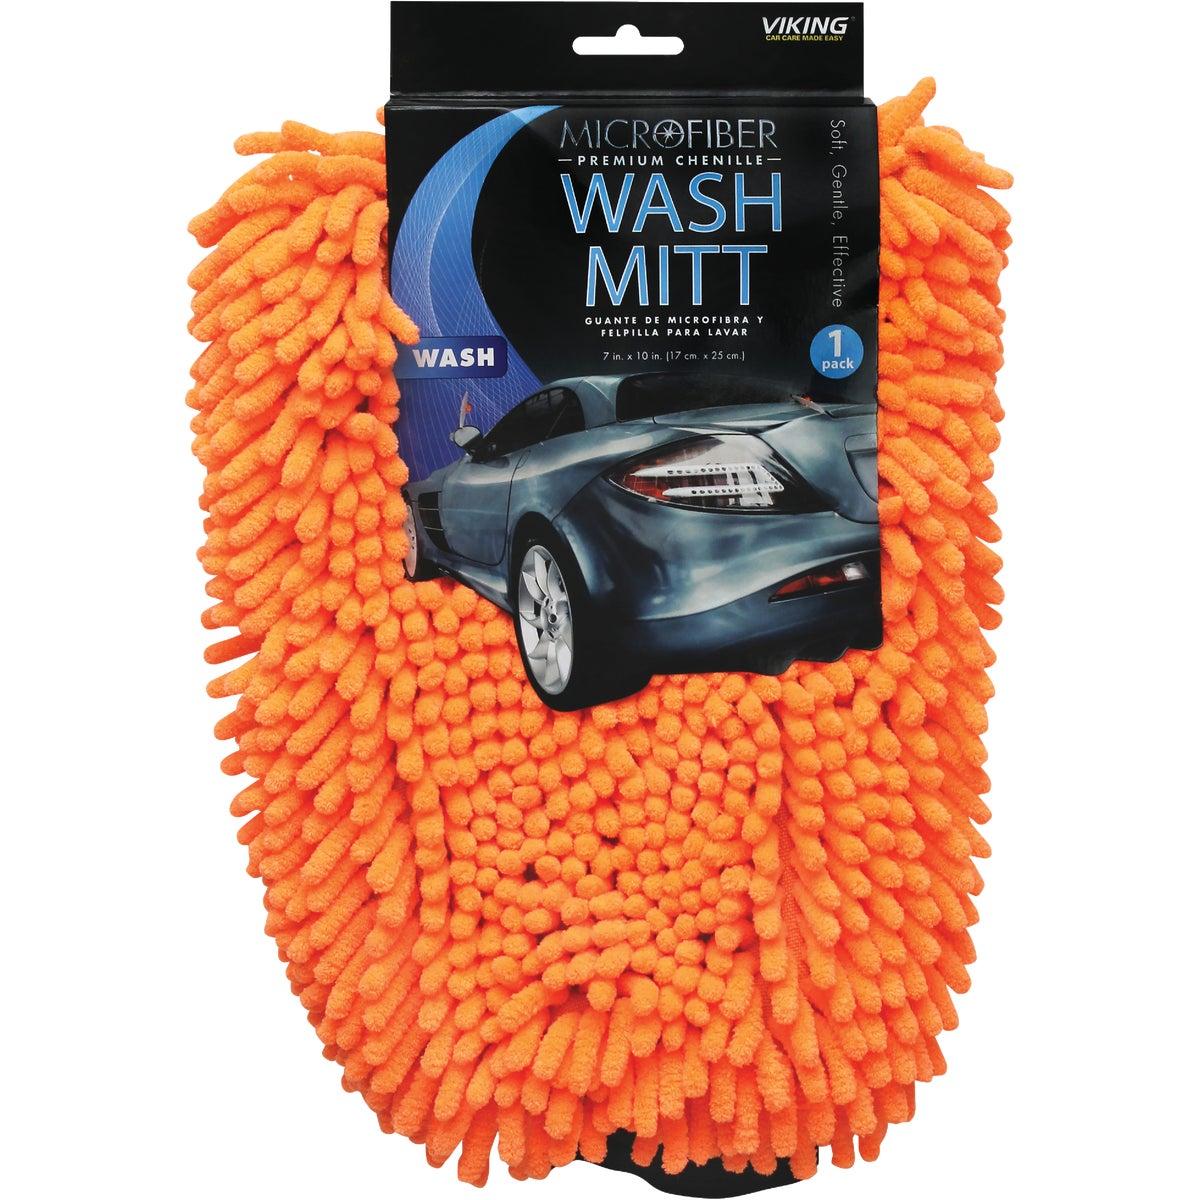 MICROFIBER WASH MITT - 40309 by Carrand Companies